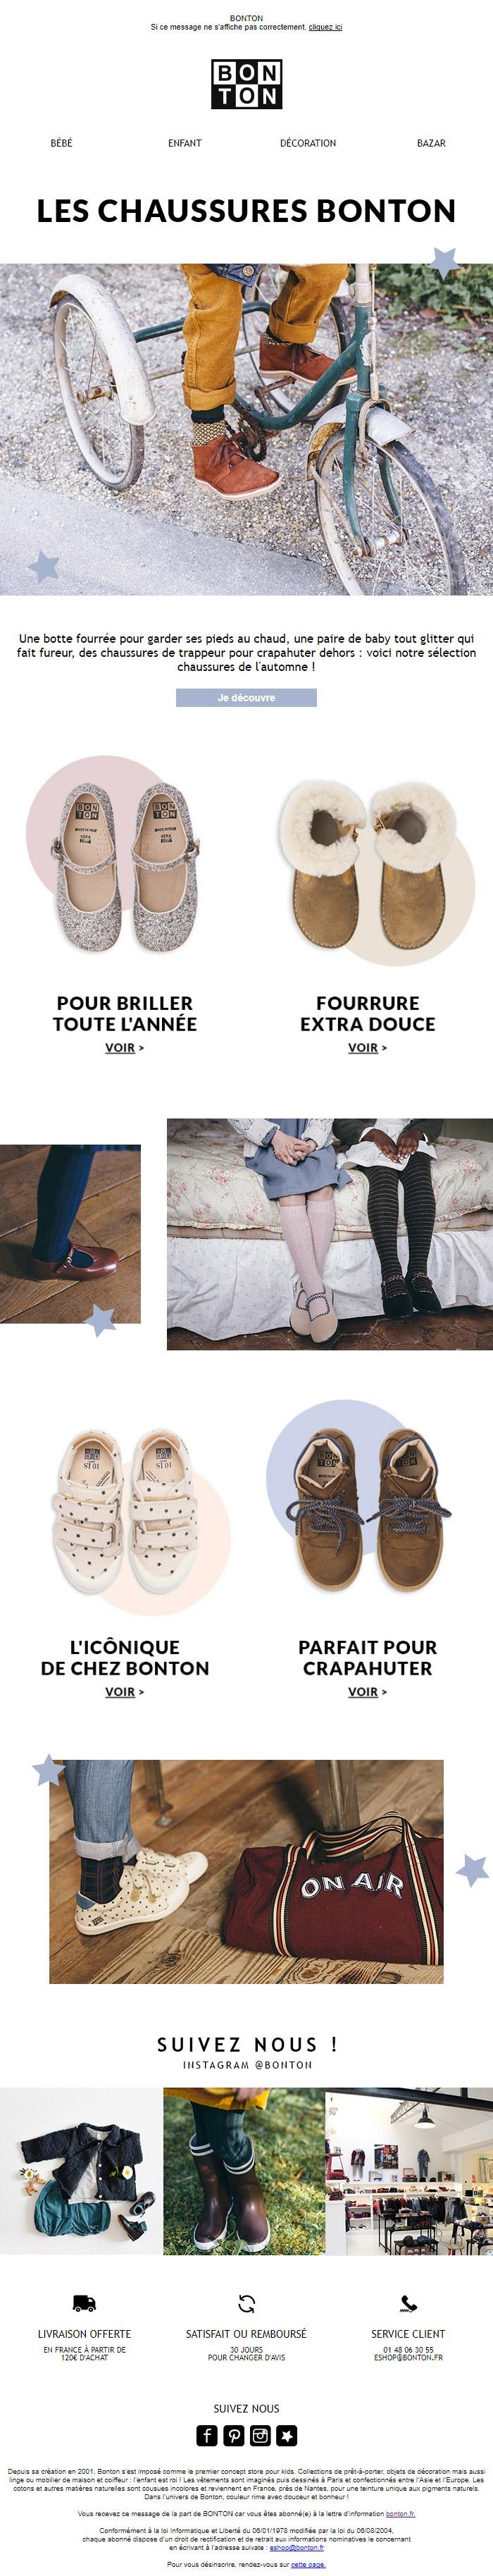 BT_s40_shoes_v5.jpg